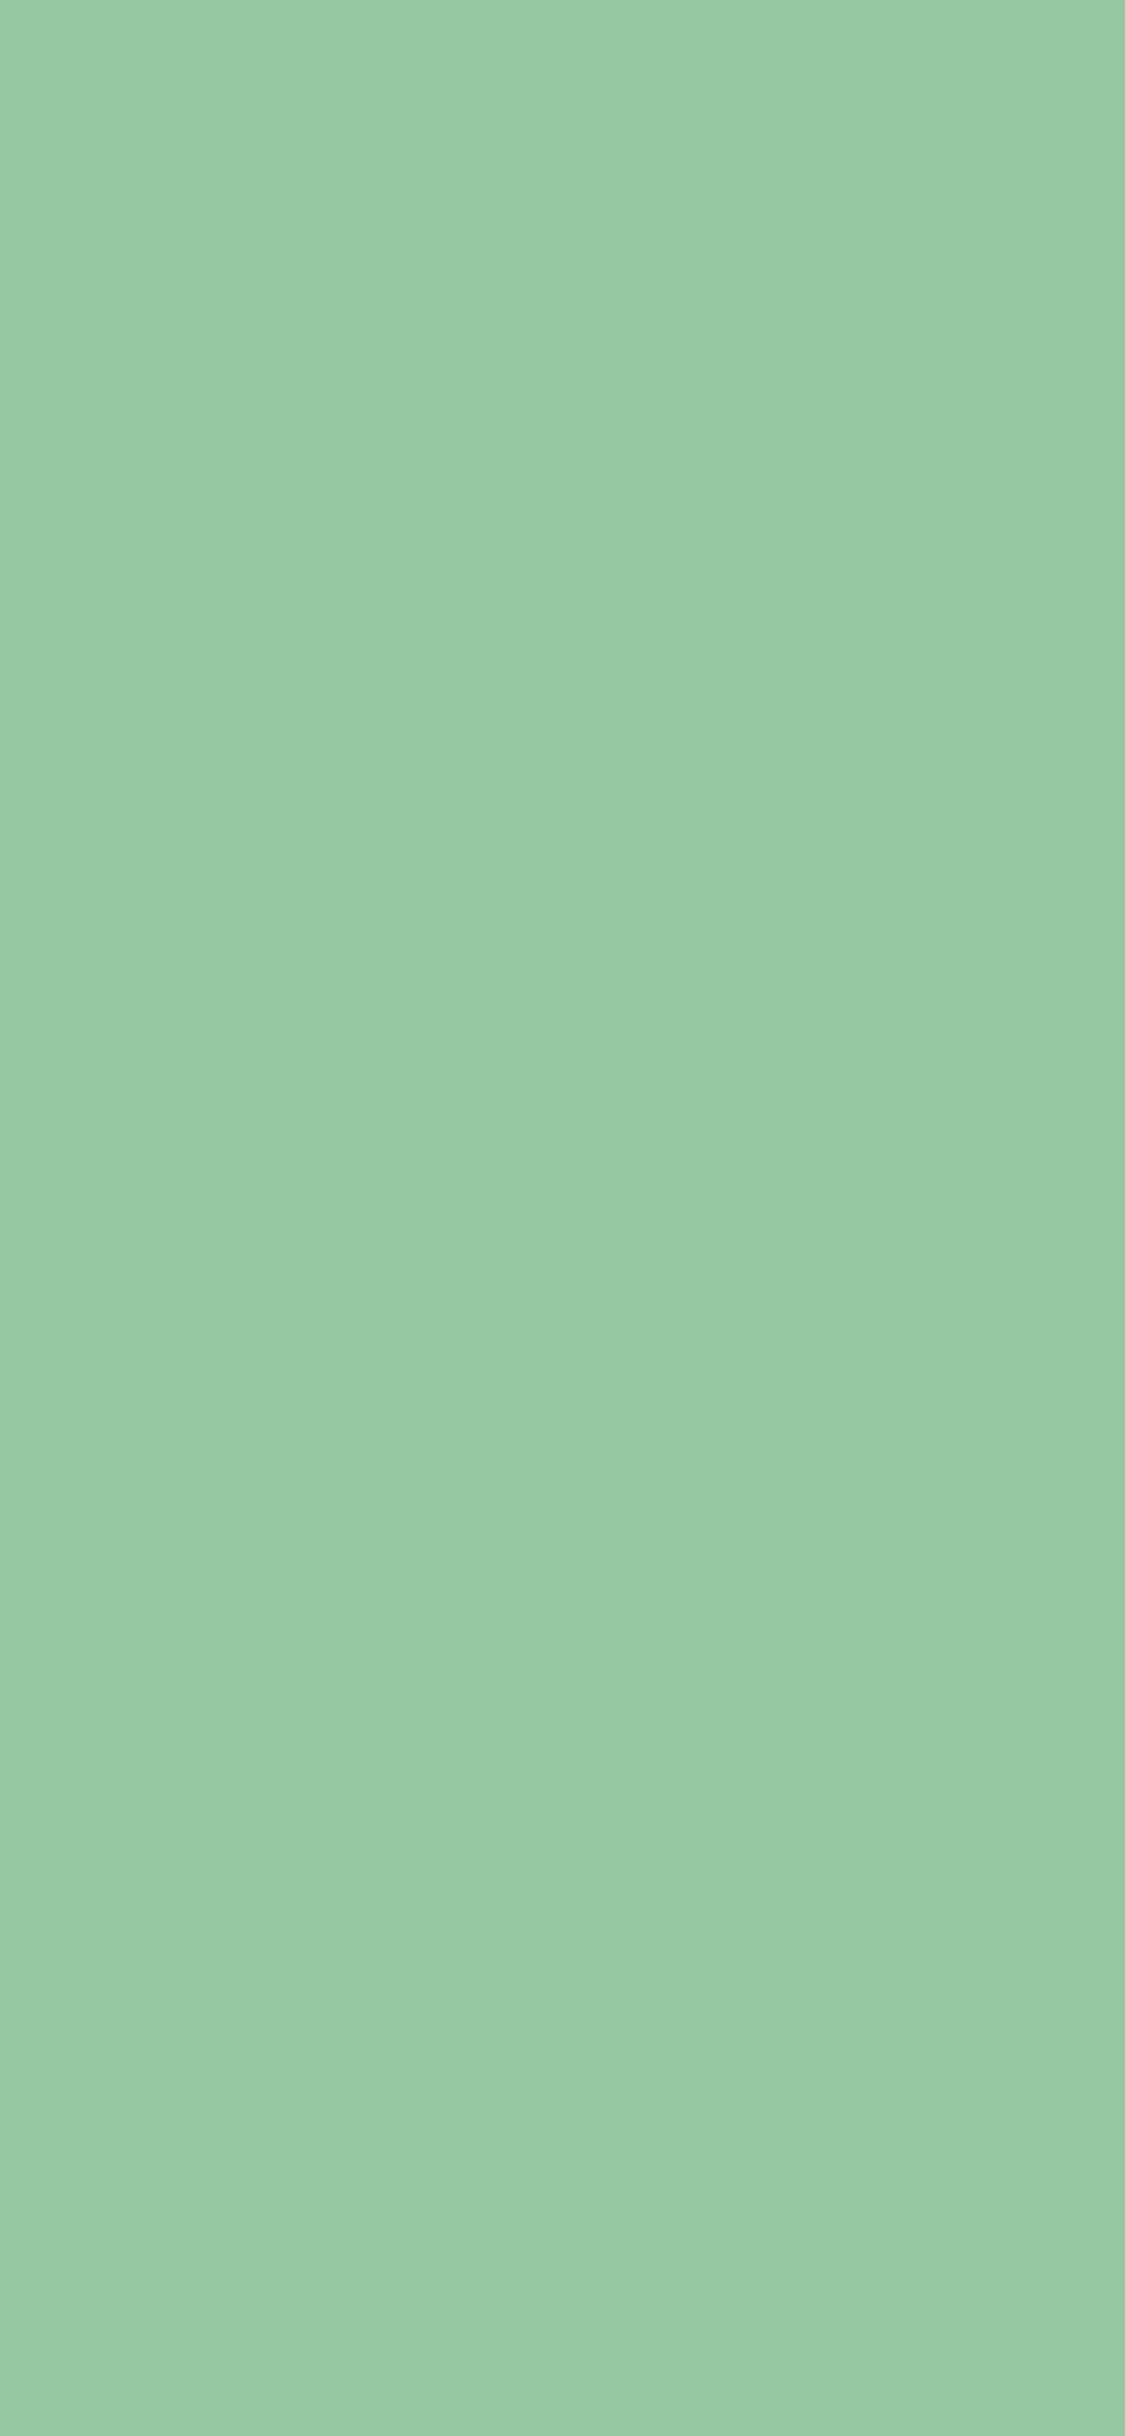 1125x2436 Eton Blue Solid Color Background